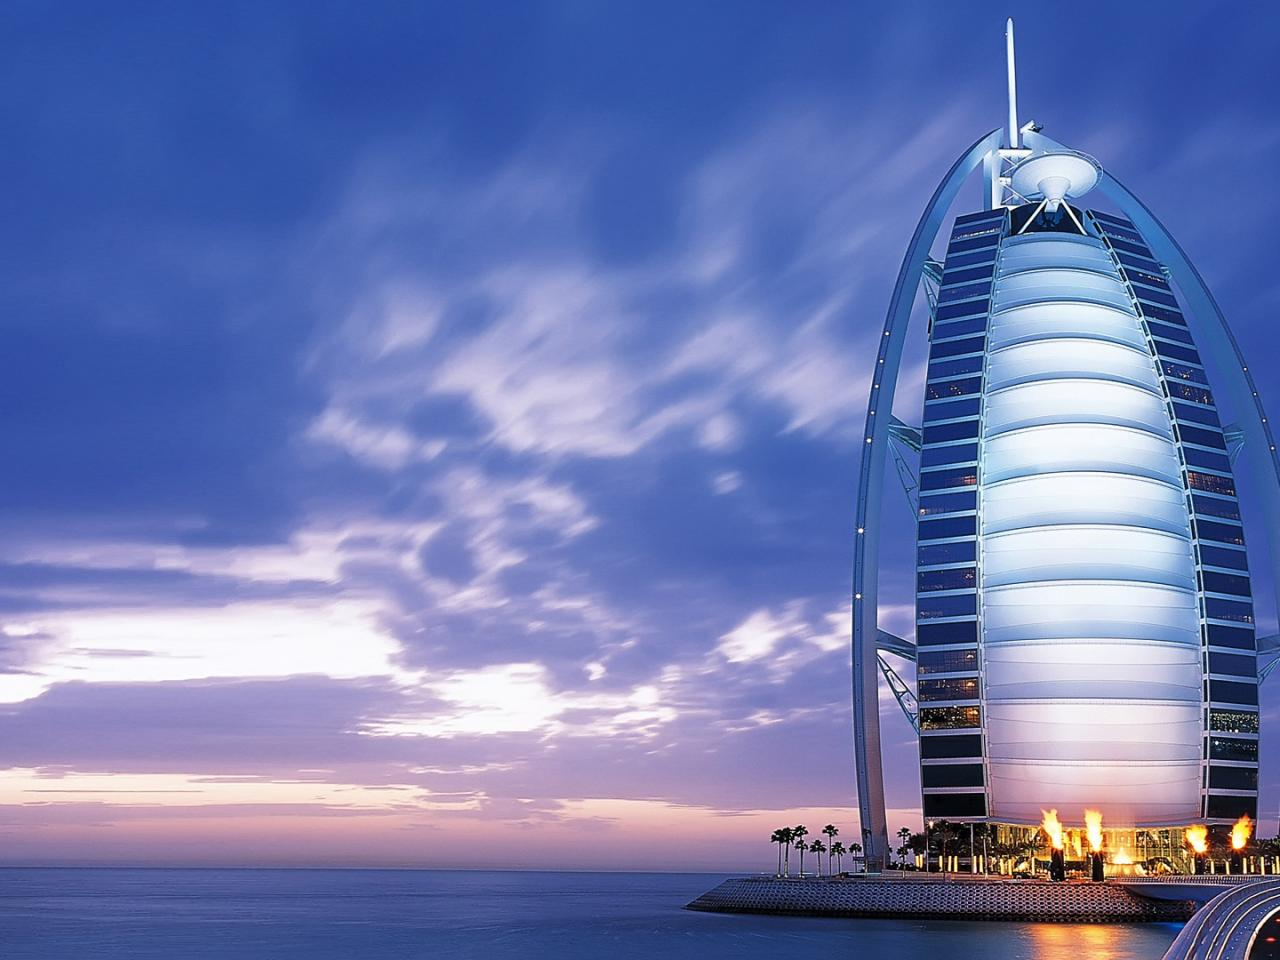 The dubai seven star hotel info new photos travel for Burj al arab 7 star hotel